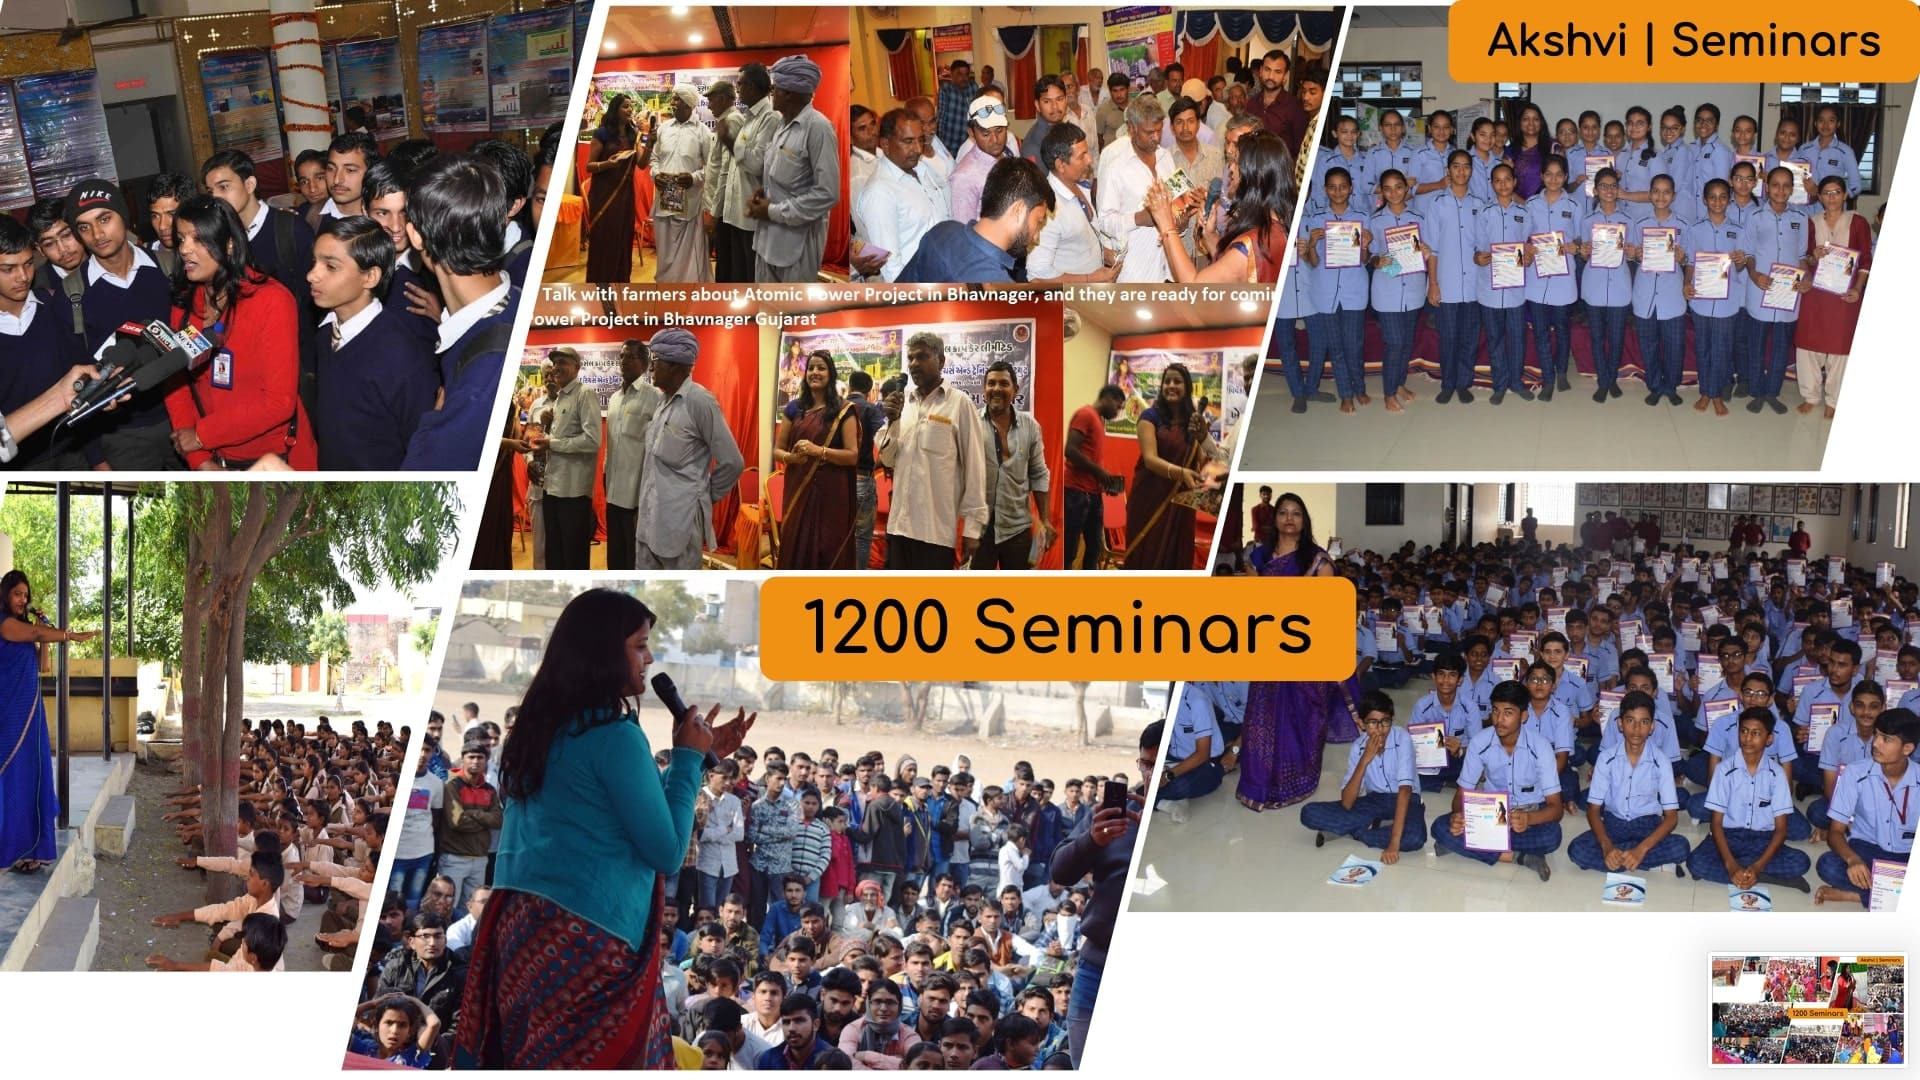 Seminars - Bharat kee Parmanu Saheli